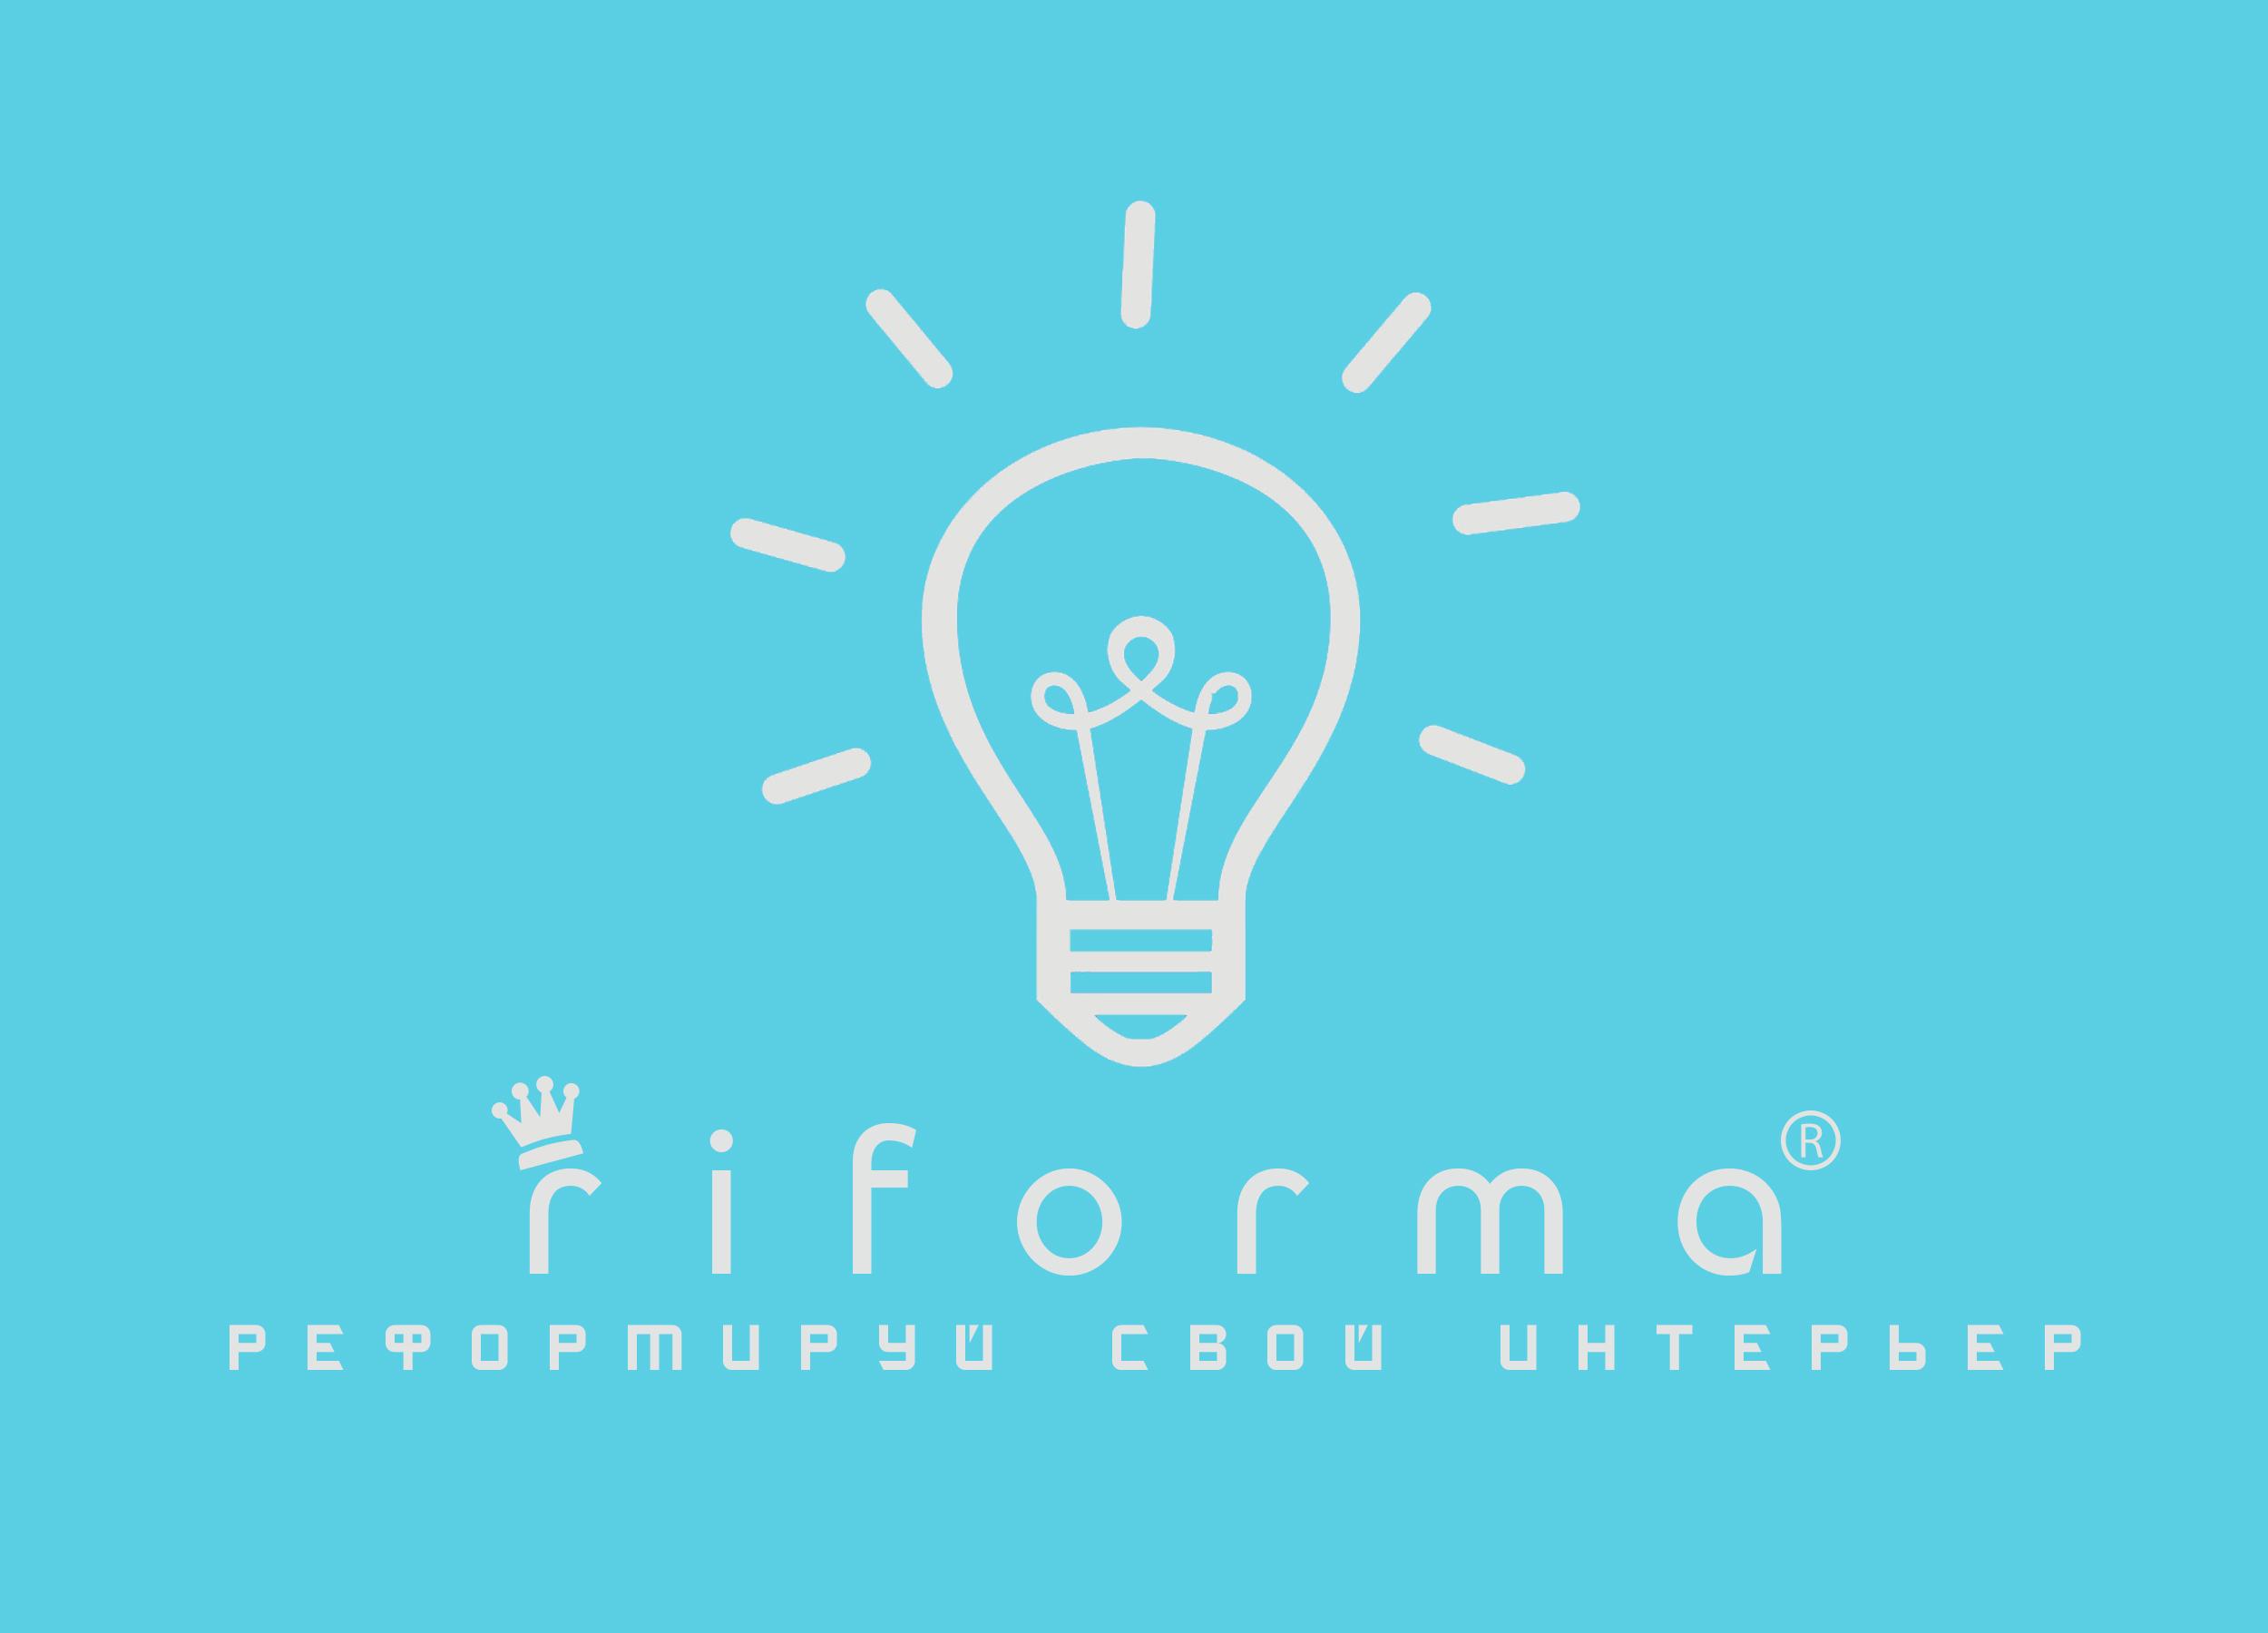 Разработка логотипа и элементов фирменного стиля фото f_4165794cd500eb00.jpg